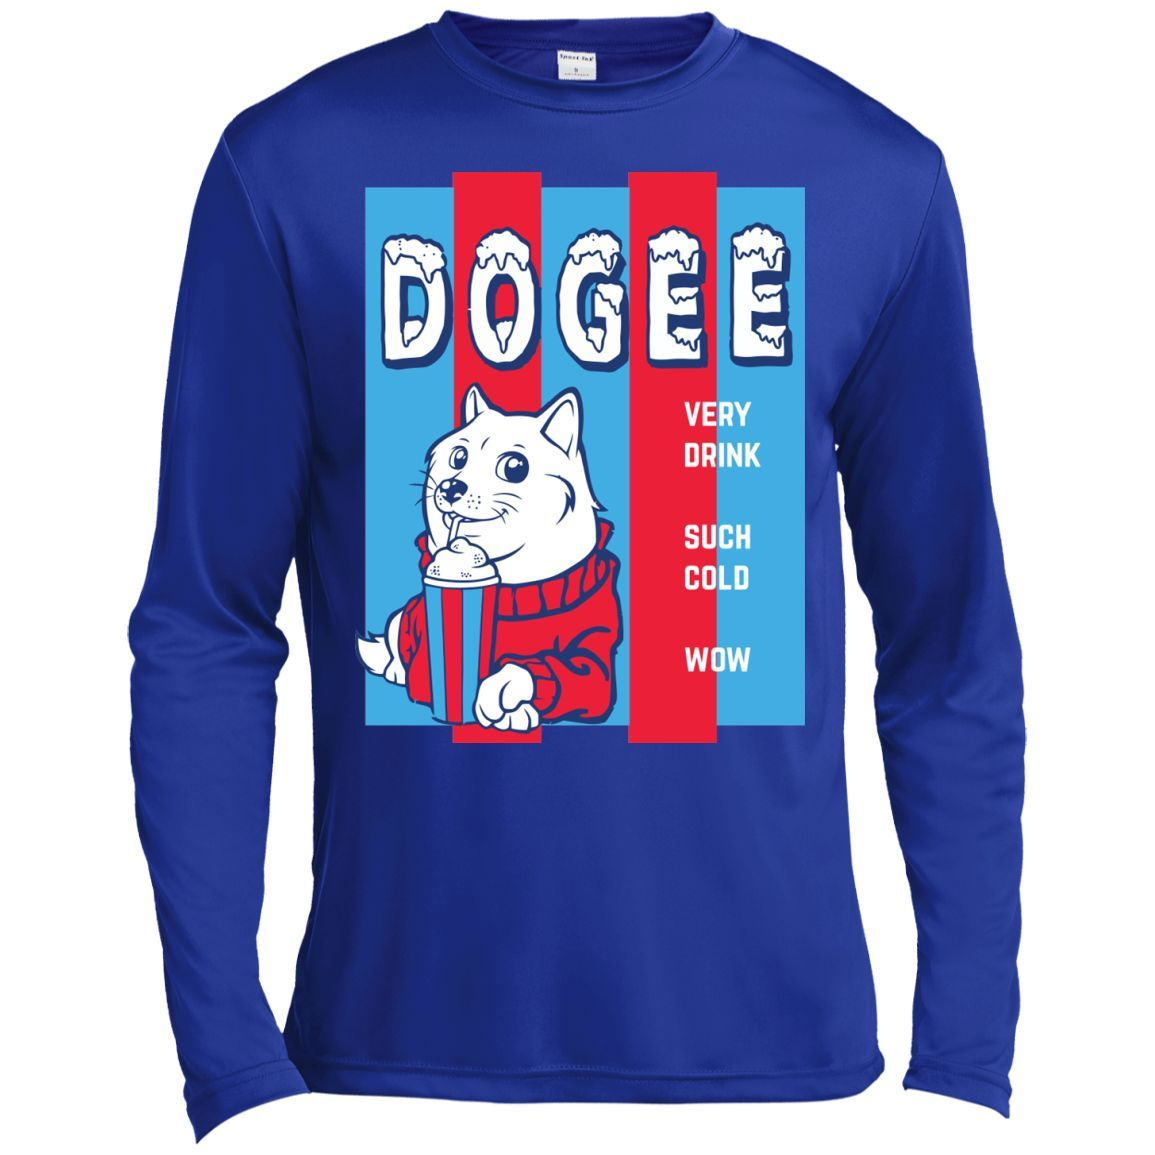 Doge Ice Slushie T-Shirt Funny Doge Meme Shirt -01 Long Sleeve Moisture Absorbing Shirt